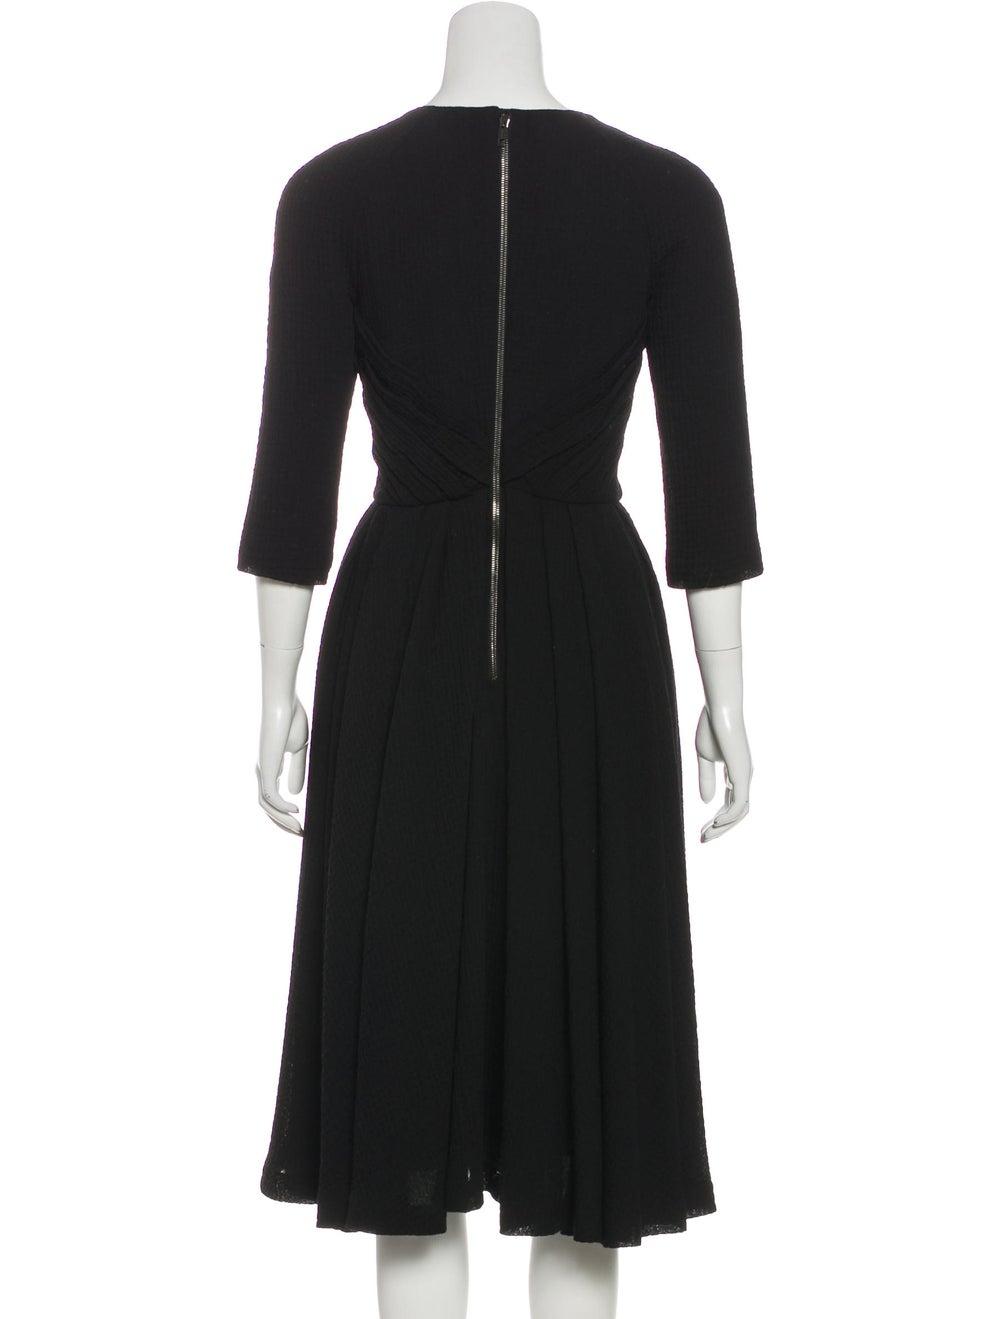 Burberry Wool Seersucker Dress Black - image 3